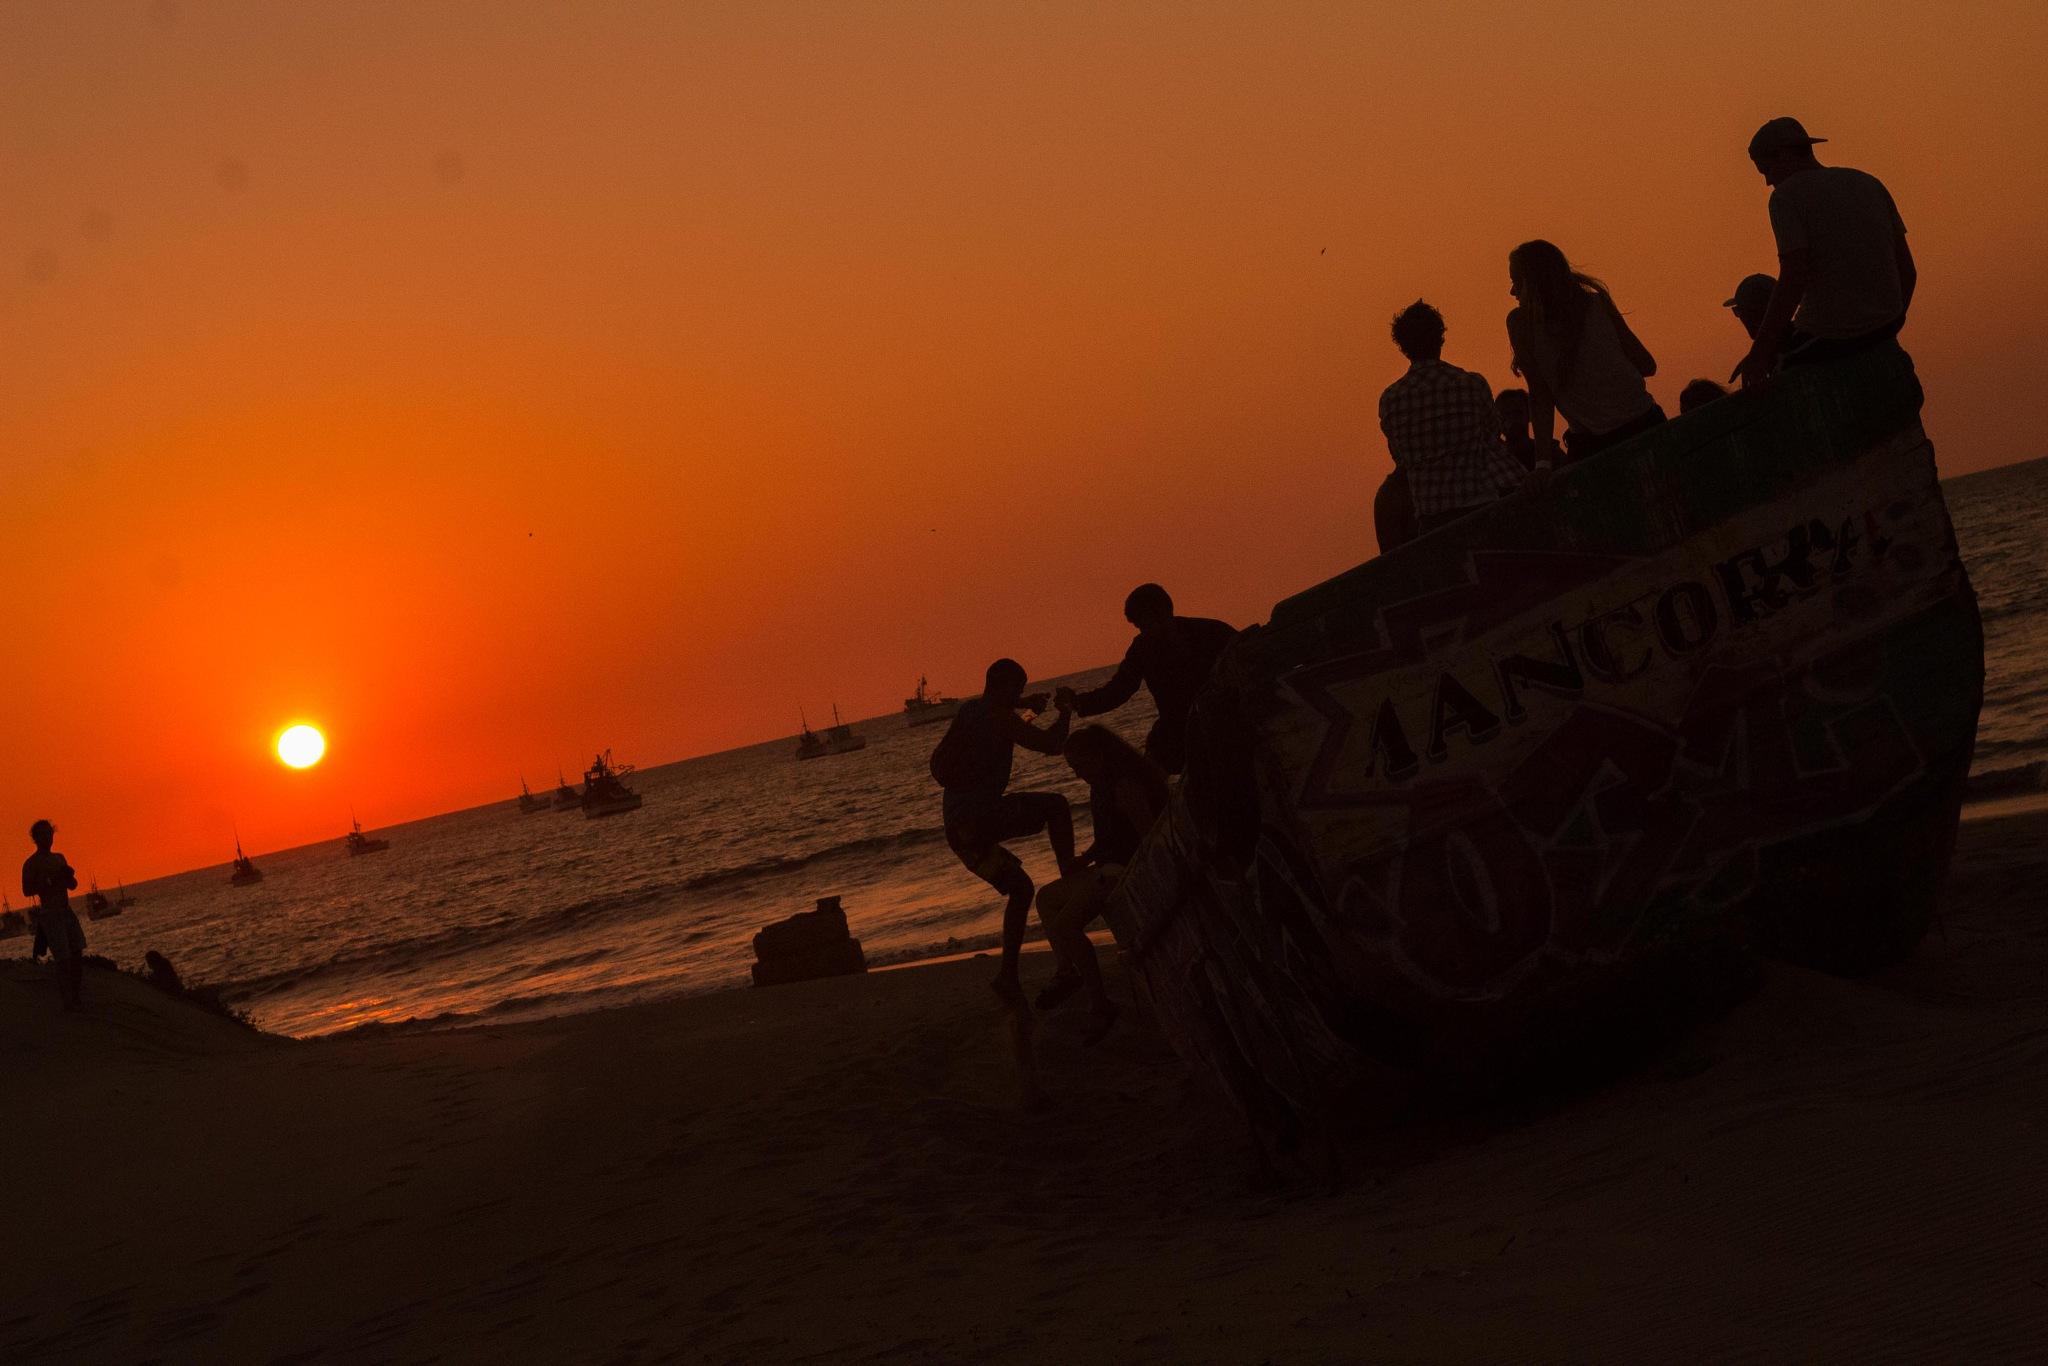 Sunset and friends by Javier Avedikian